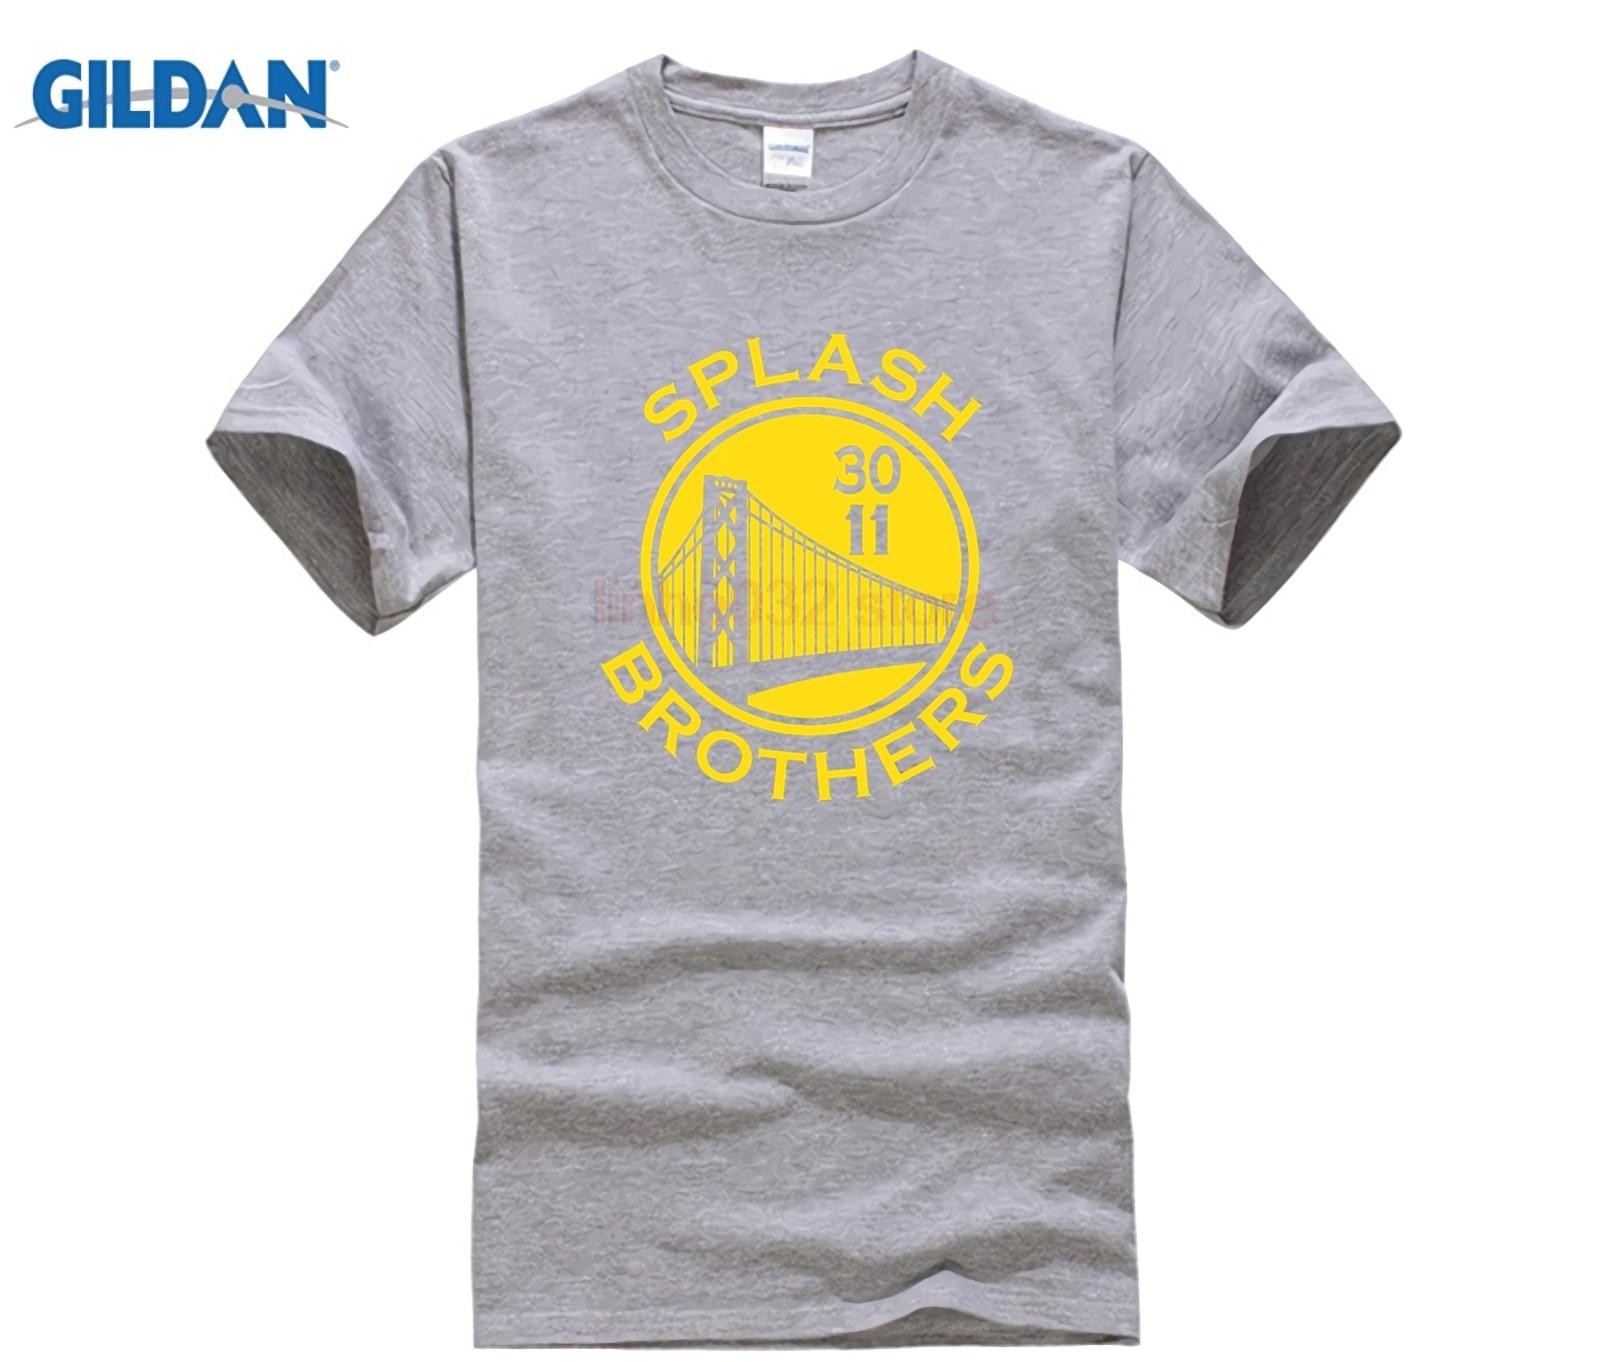 Gildan designer t camisa venda quente super criativo respingo camisa estado dourado stephen curry klay thompson camisetas masculinas